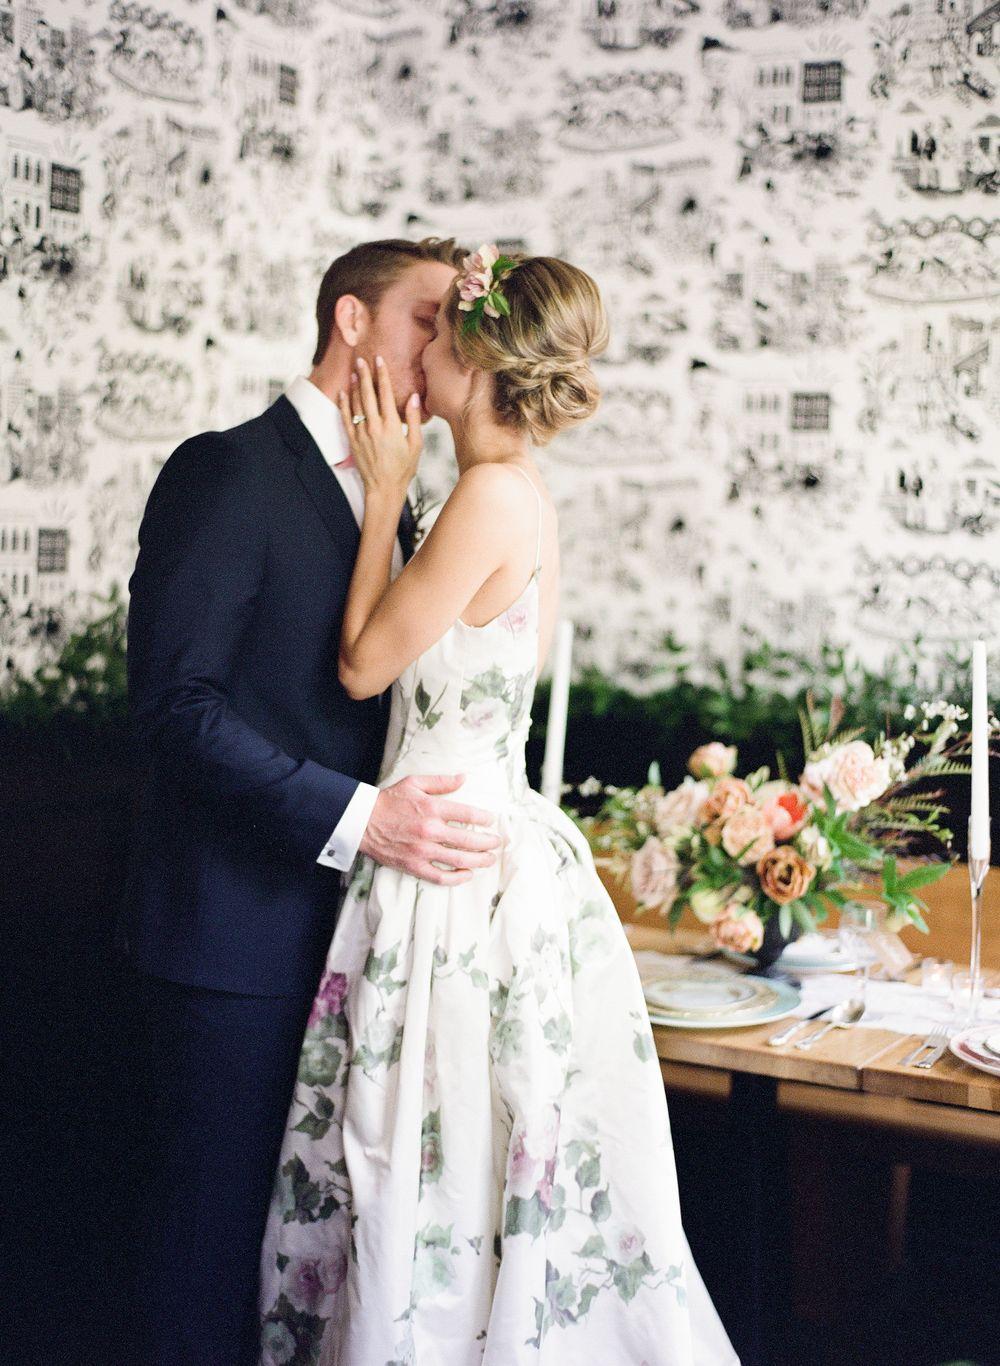 Something blue wedding floral wedding dress ashley peraino ashley